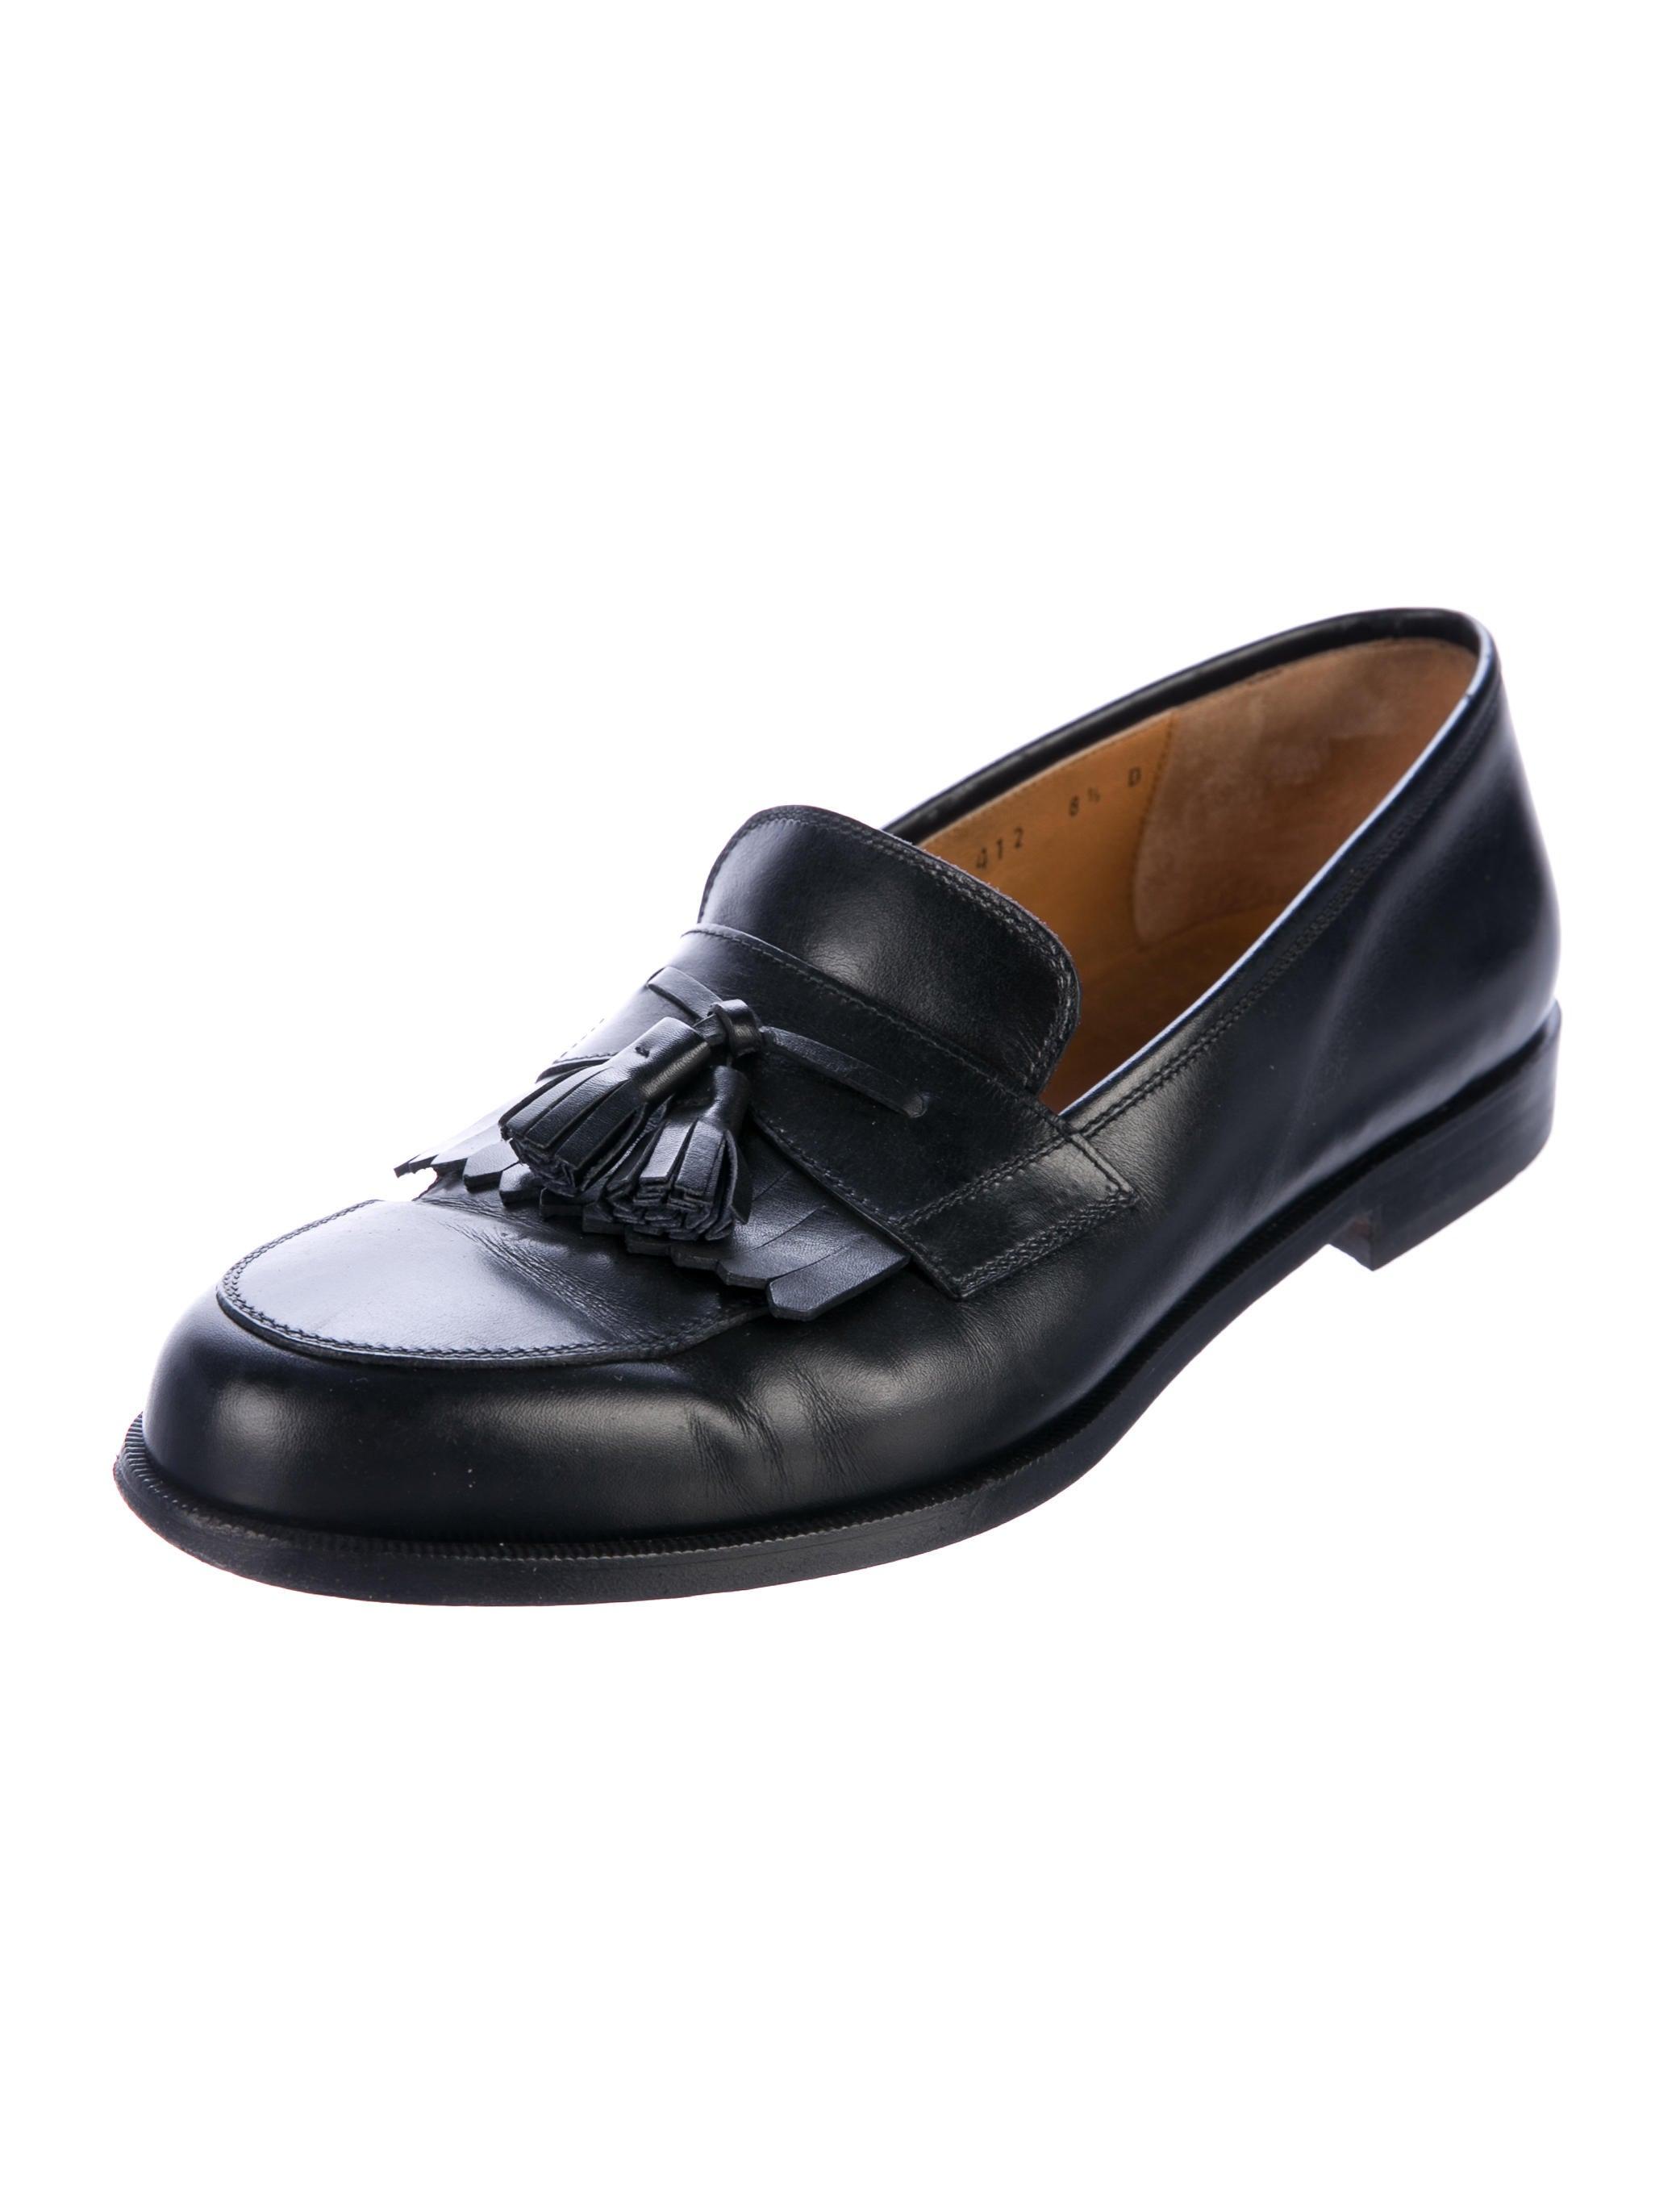 salvatore ferragamo tassel dress loafers shoes